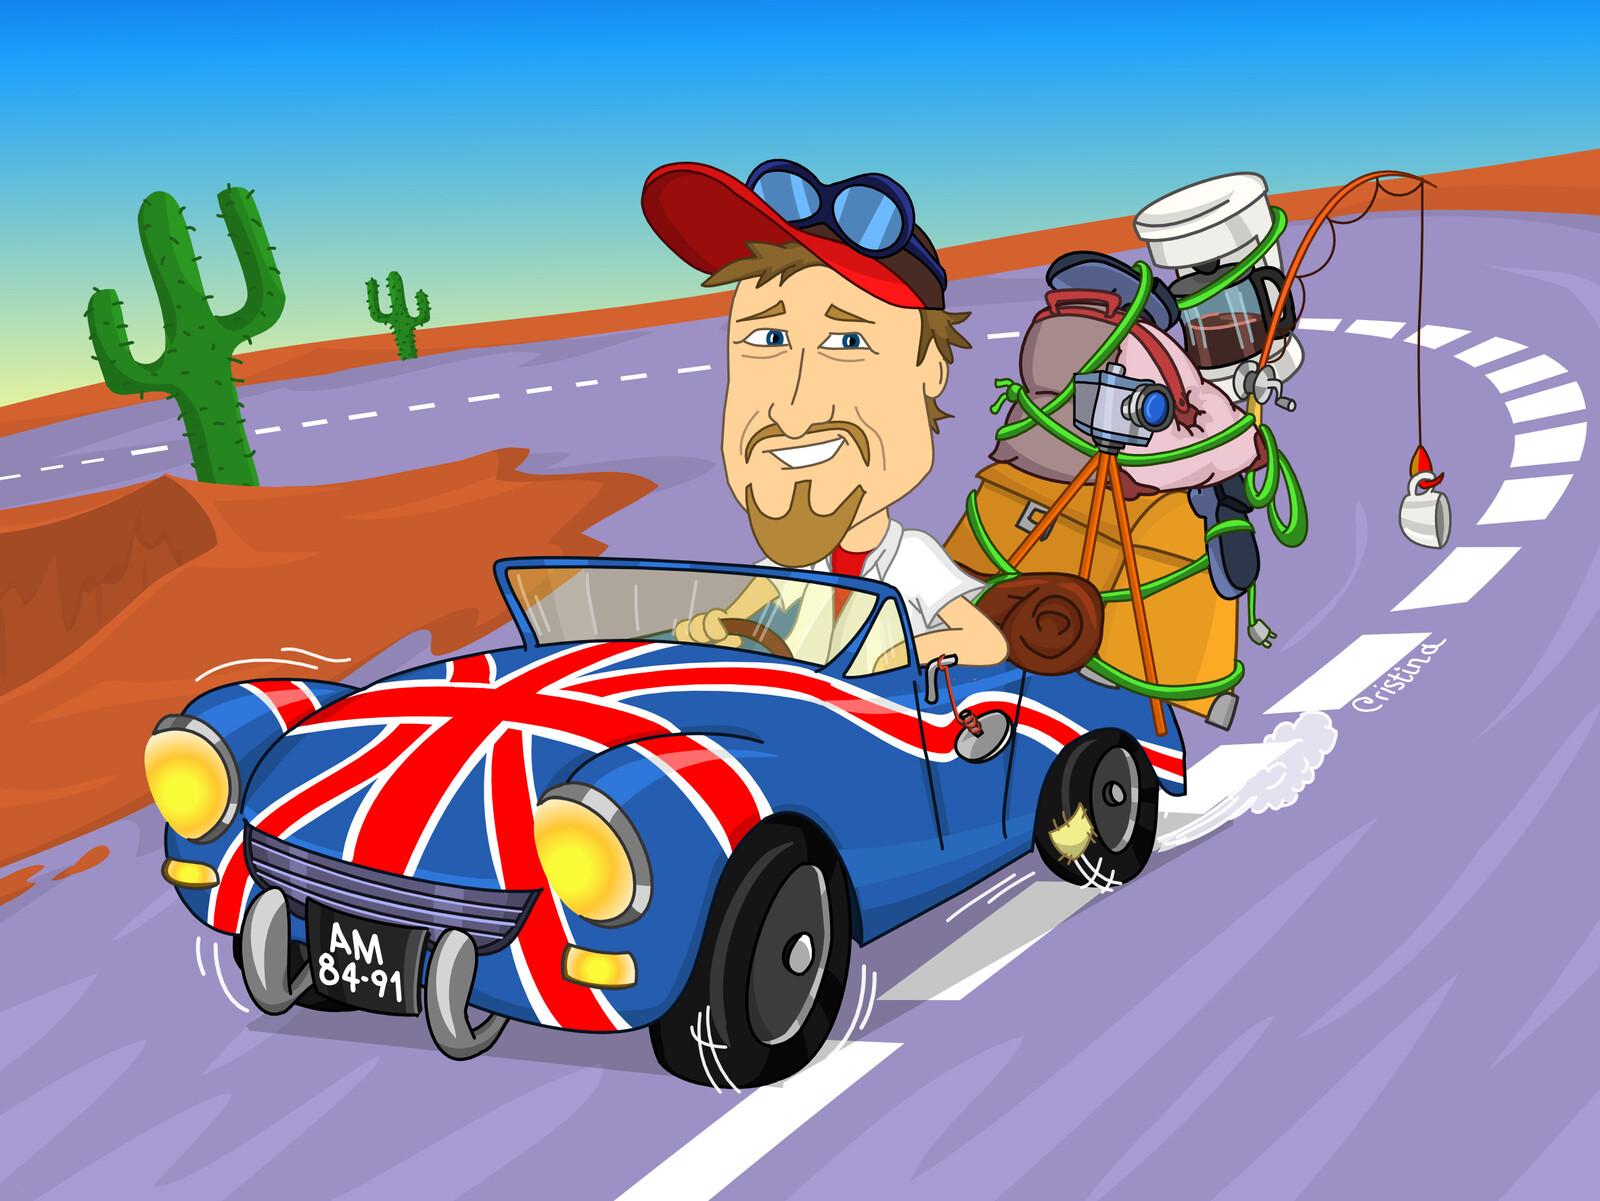 Living the dream, caricature illustration